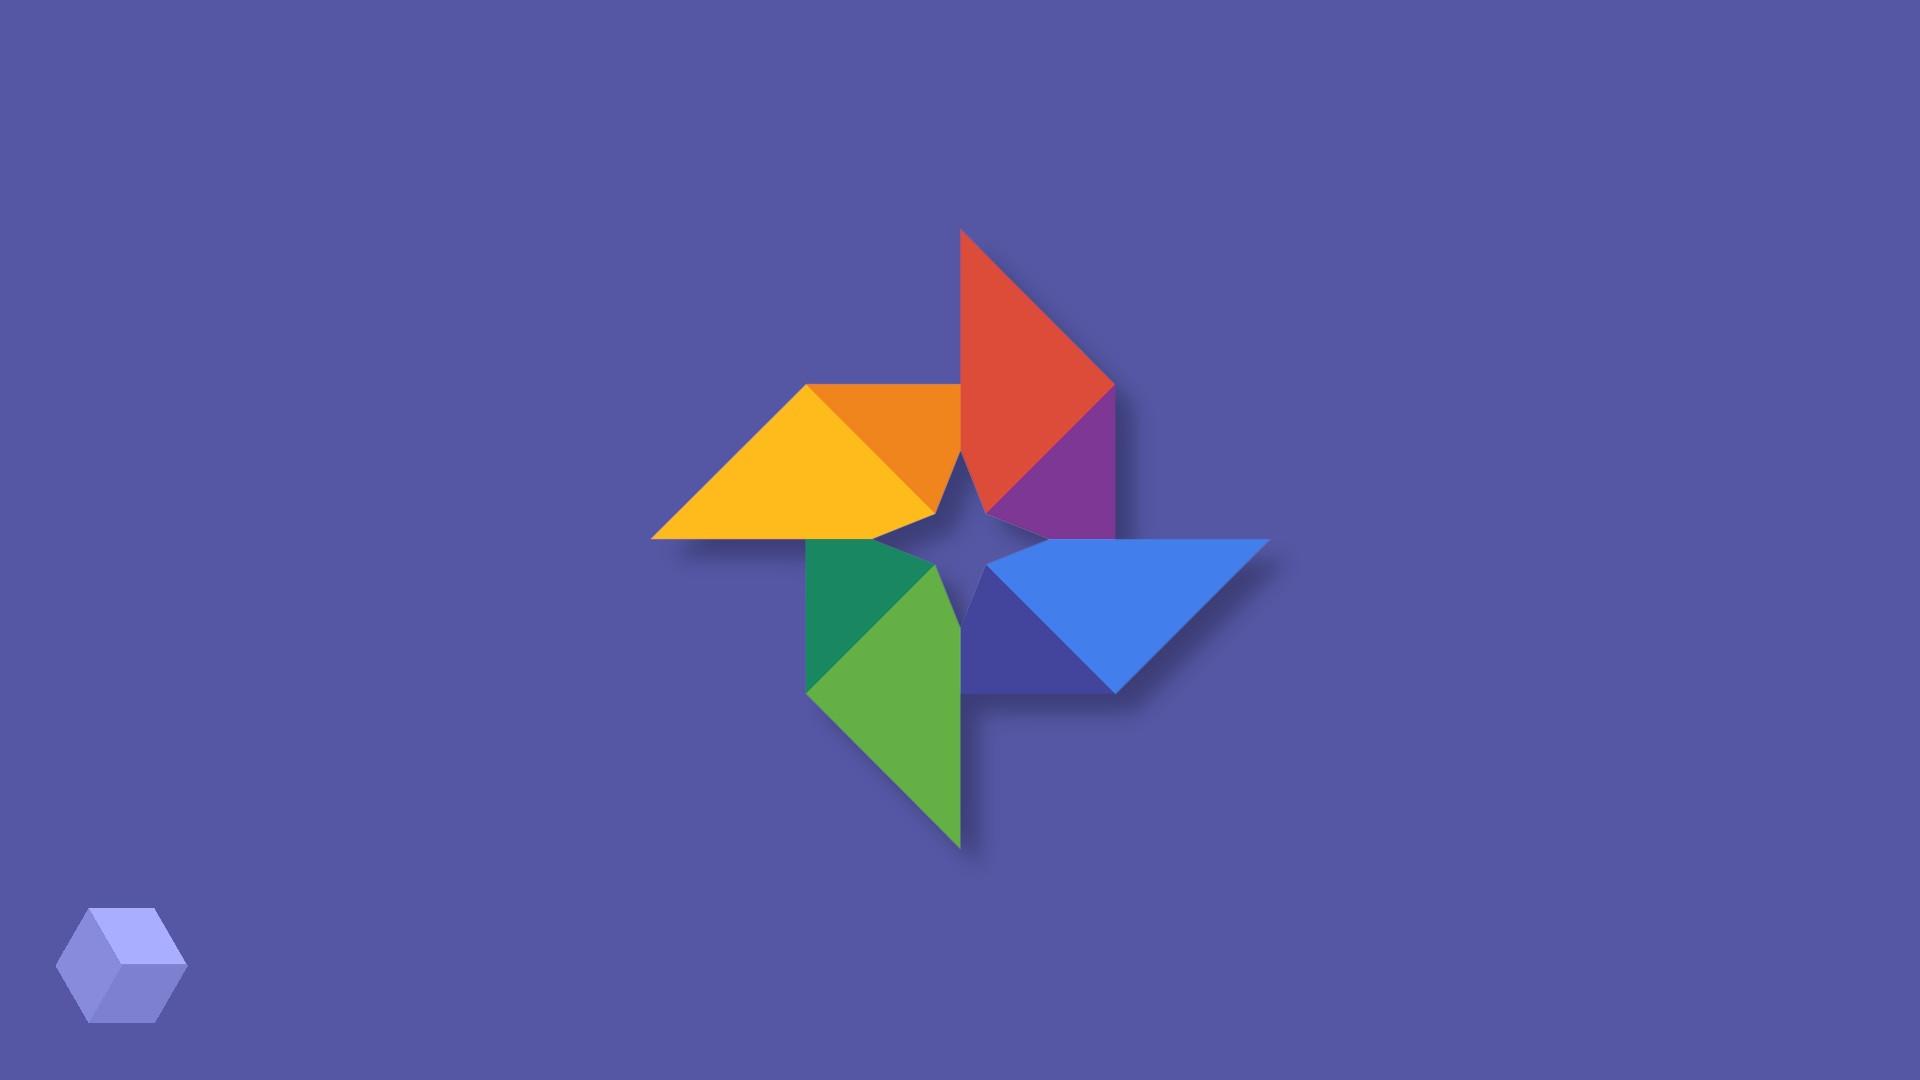 Веб-версия «Google Фото» обновилась для соответствия Material Theme